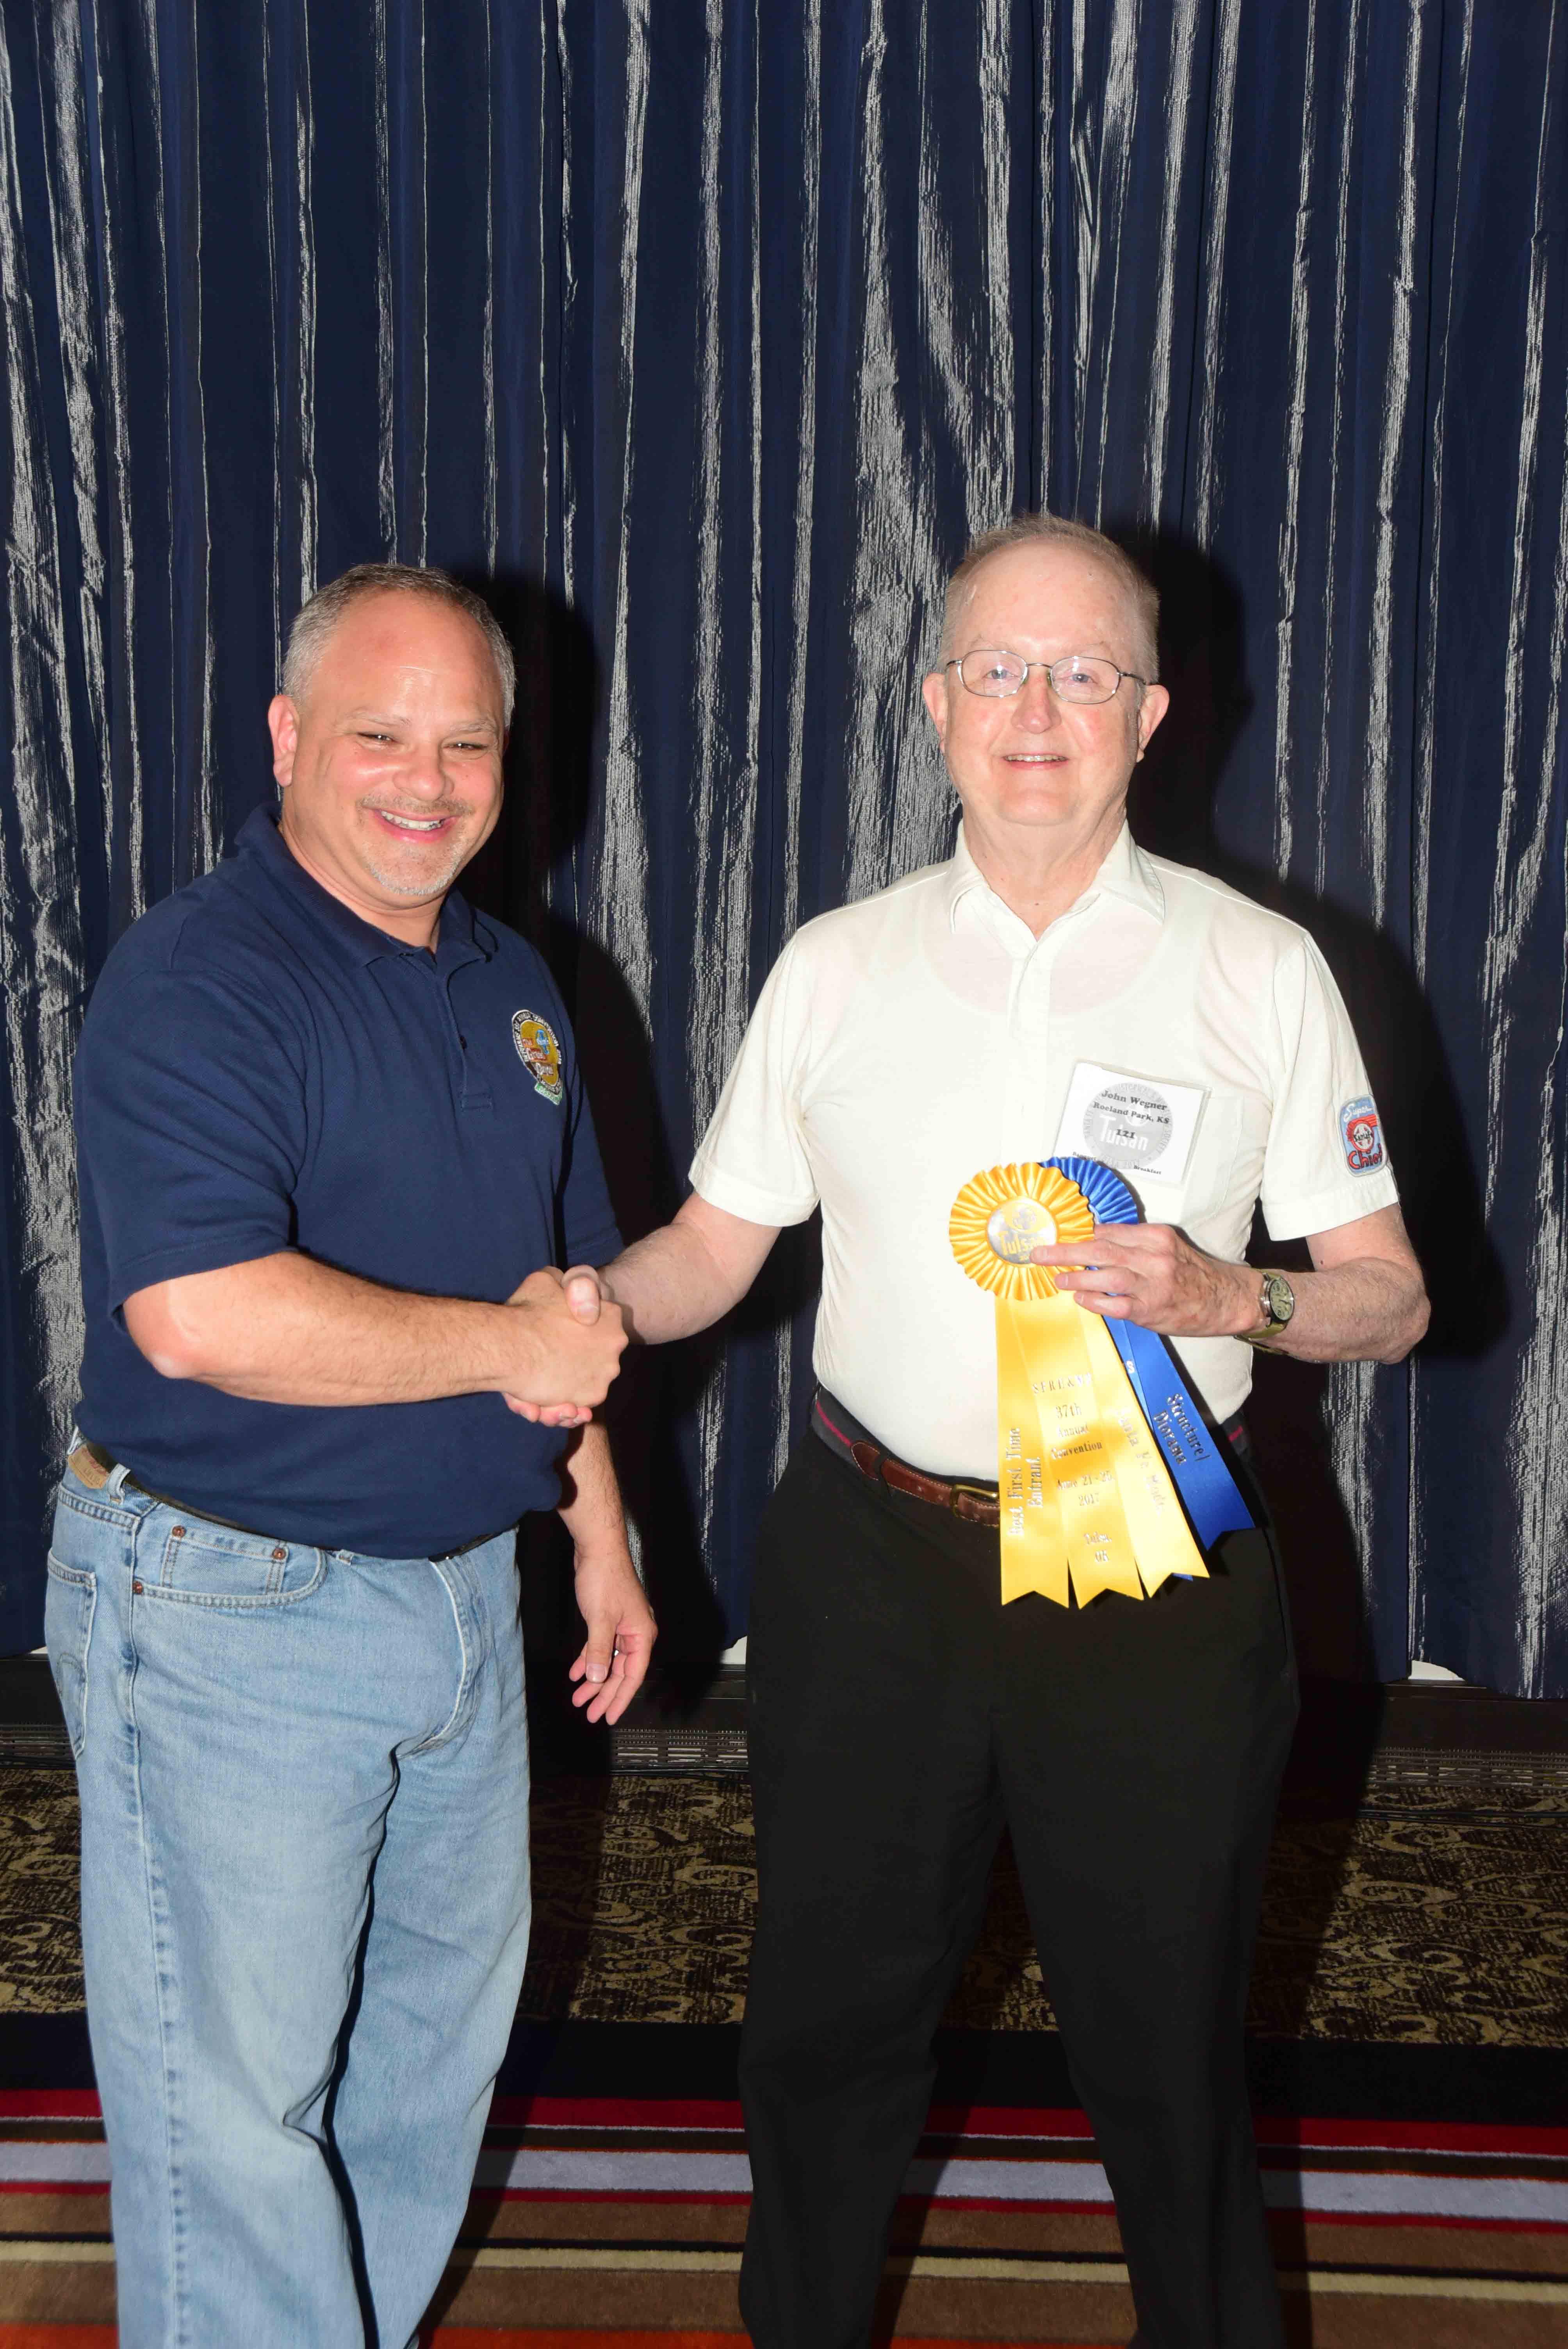 John Hotvet accepting Best First Time Entry ribbon